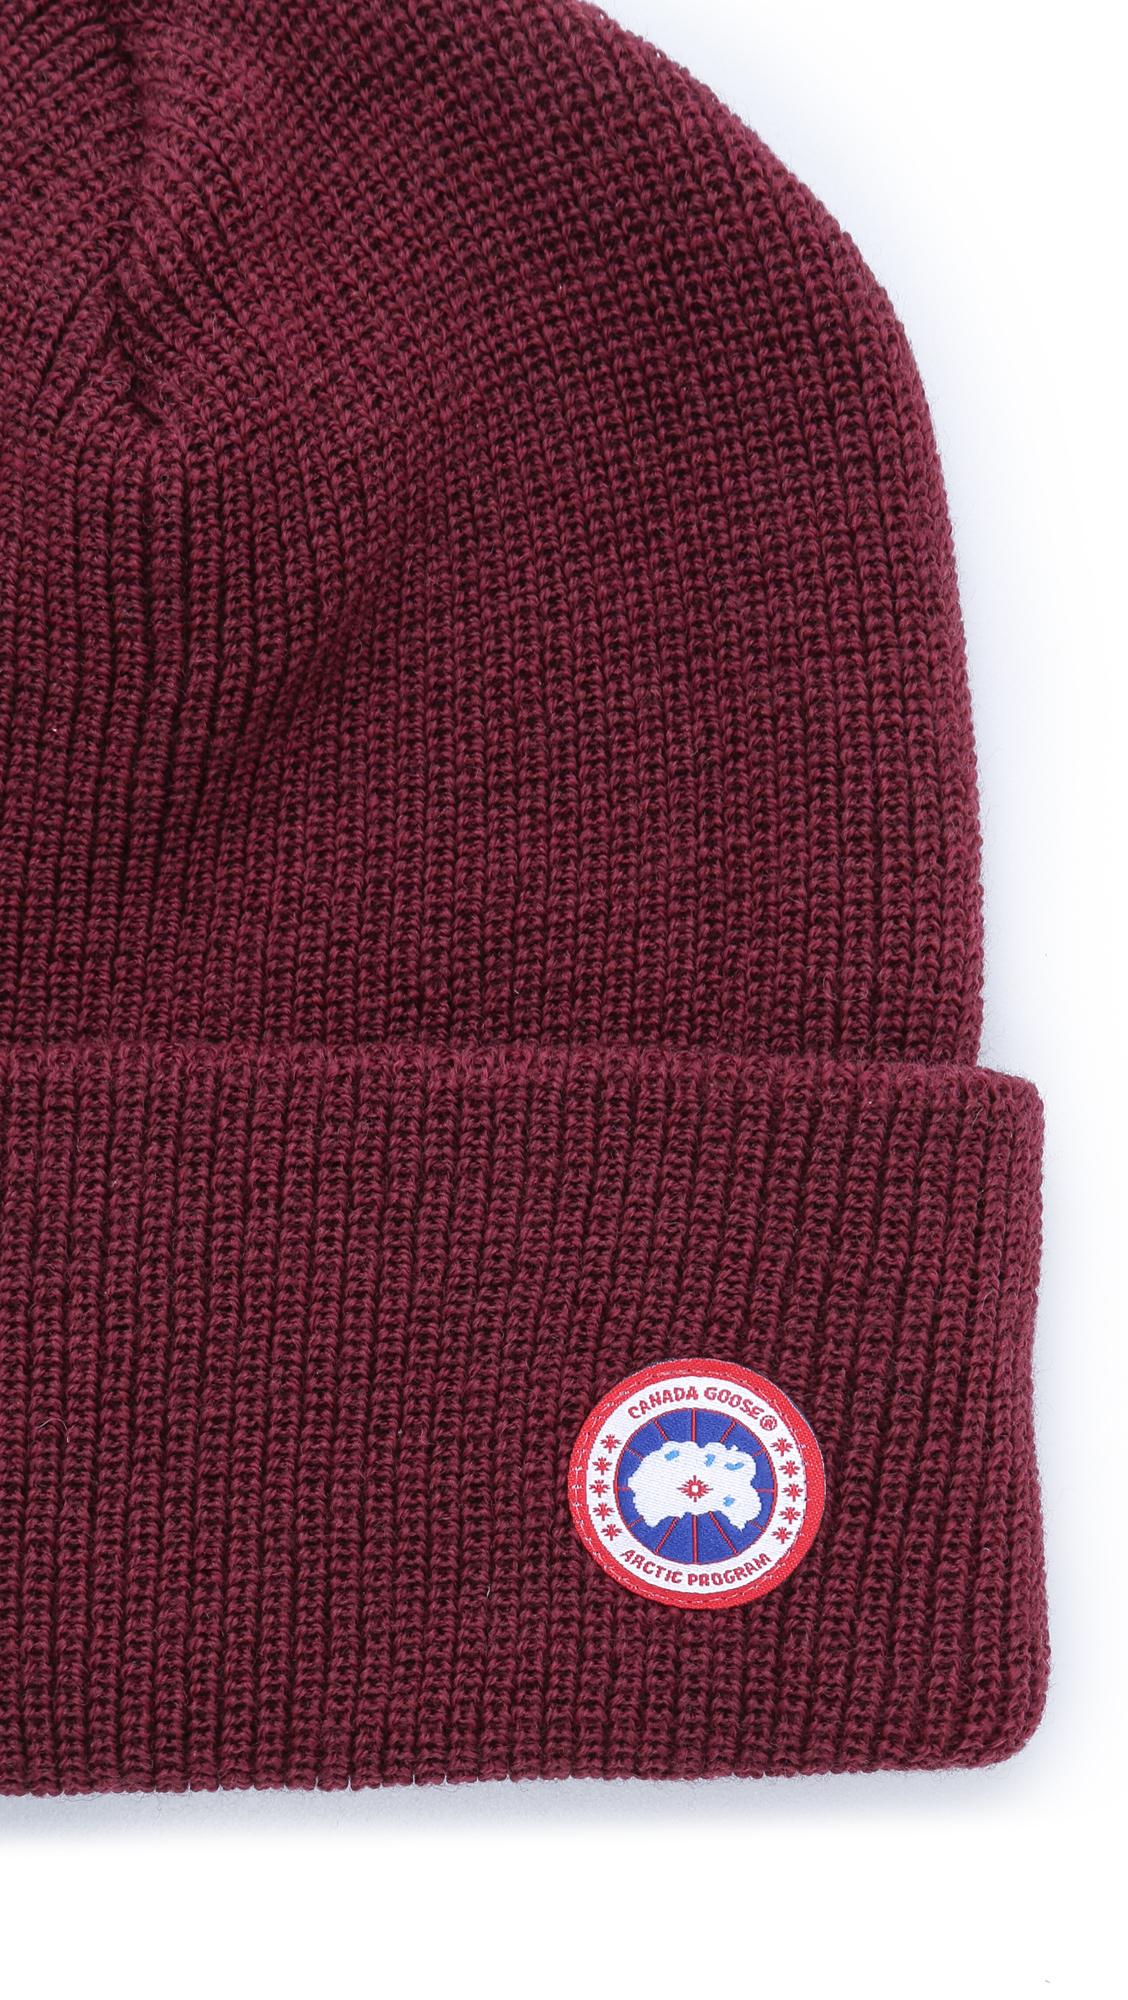 ac01ac6784f Canada Goose Merino Wool Watch Cap in Red for Men - Lyst